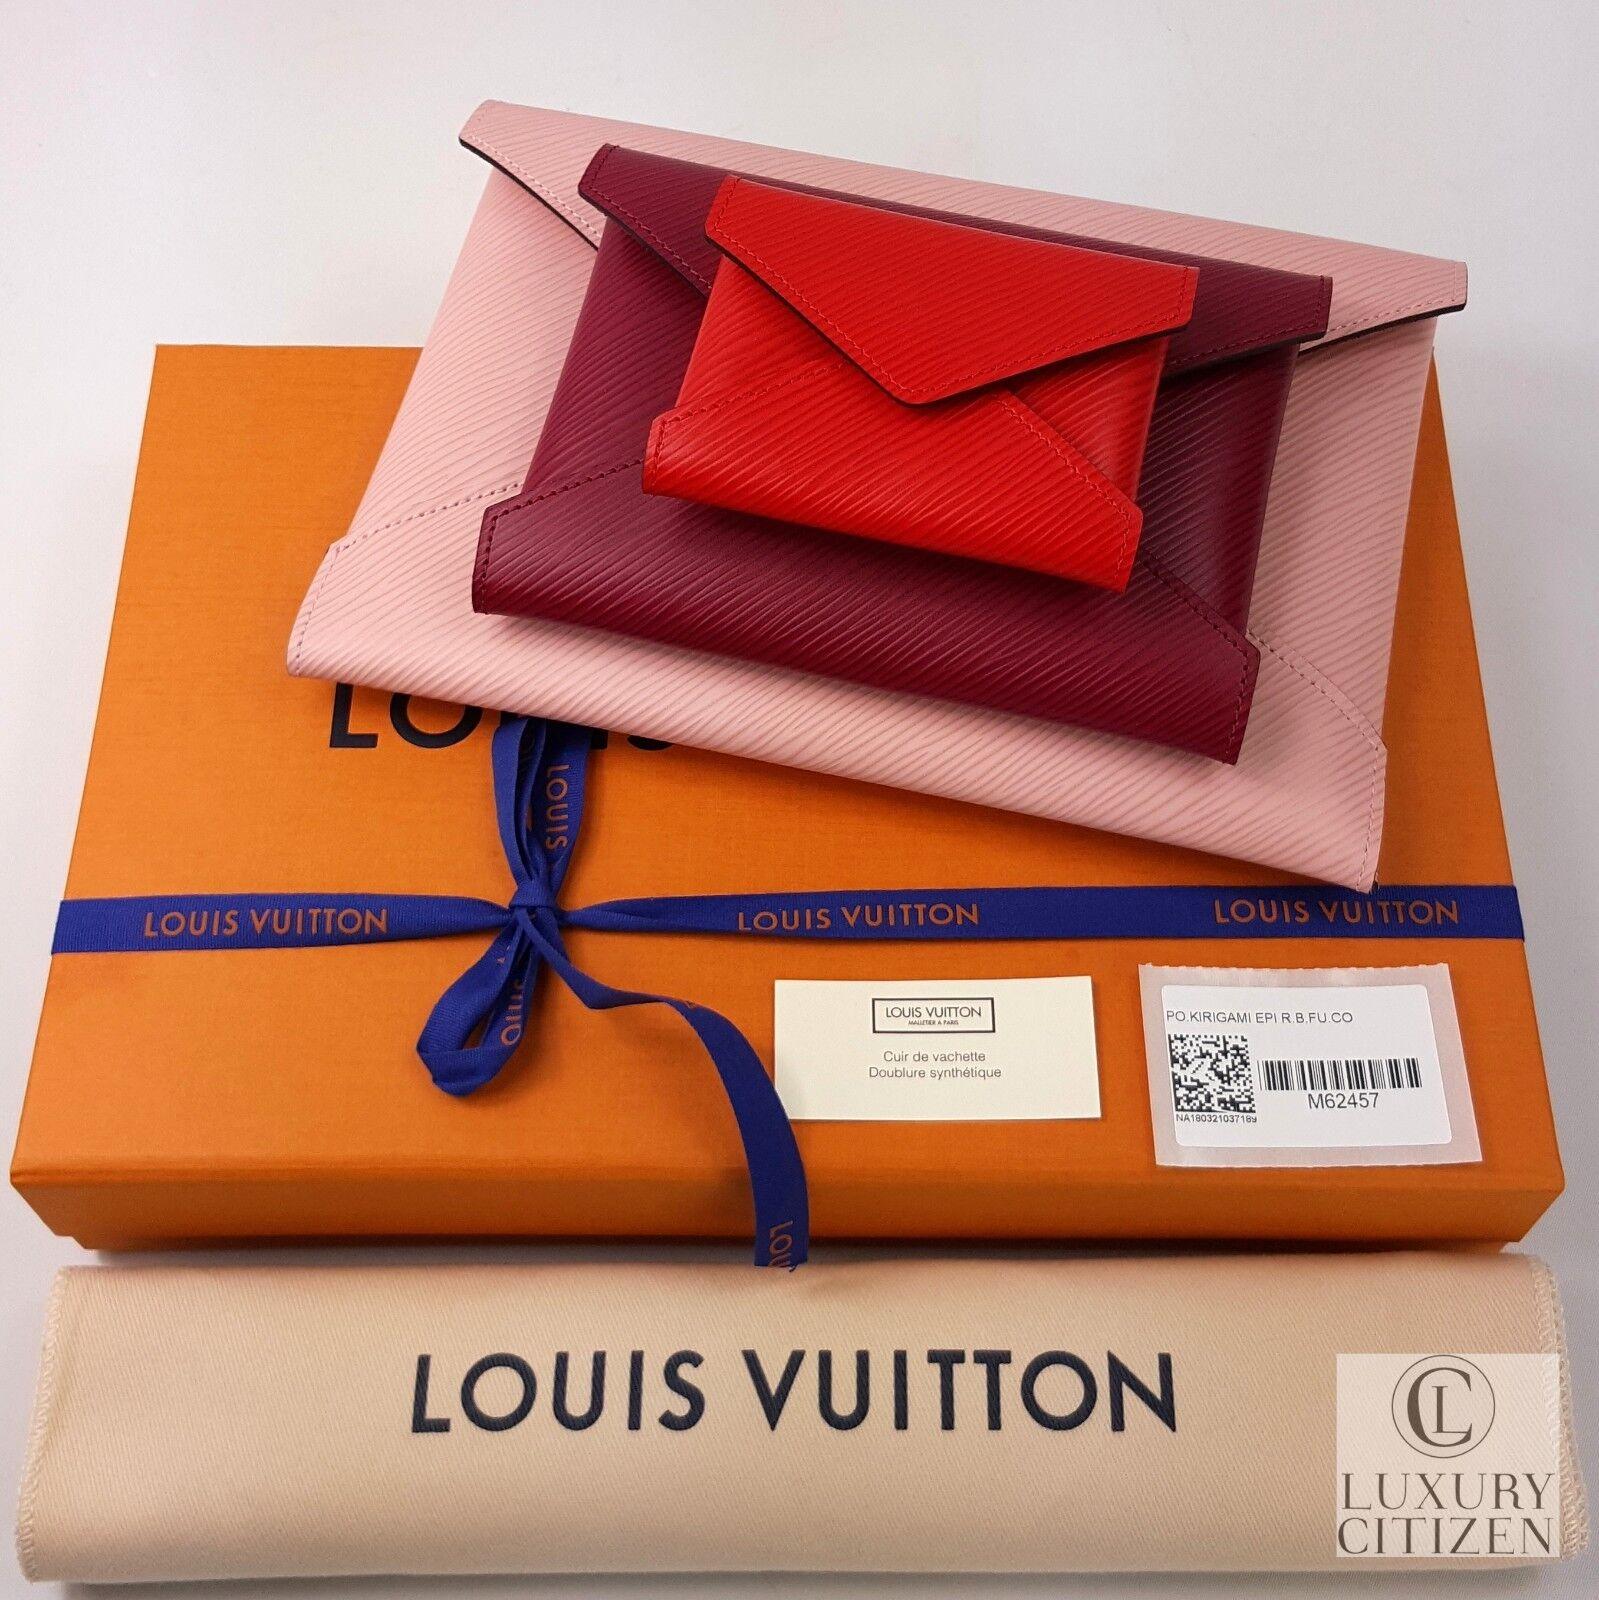 AUTHENTIC NEW LOUIS VUITTON POCHETTE KIRIGAMI EPI LEATHER Pink Wallet Clutch Bag